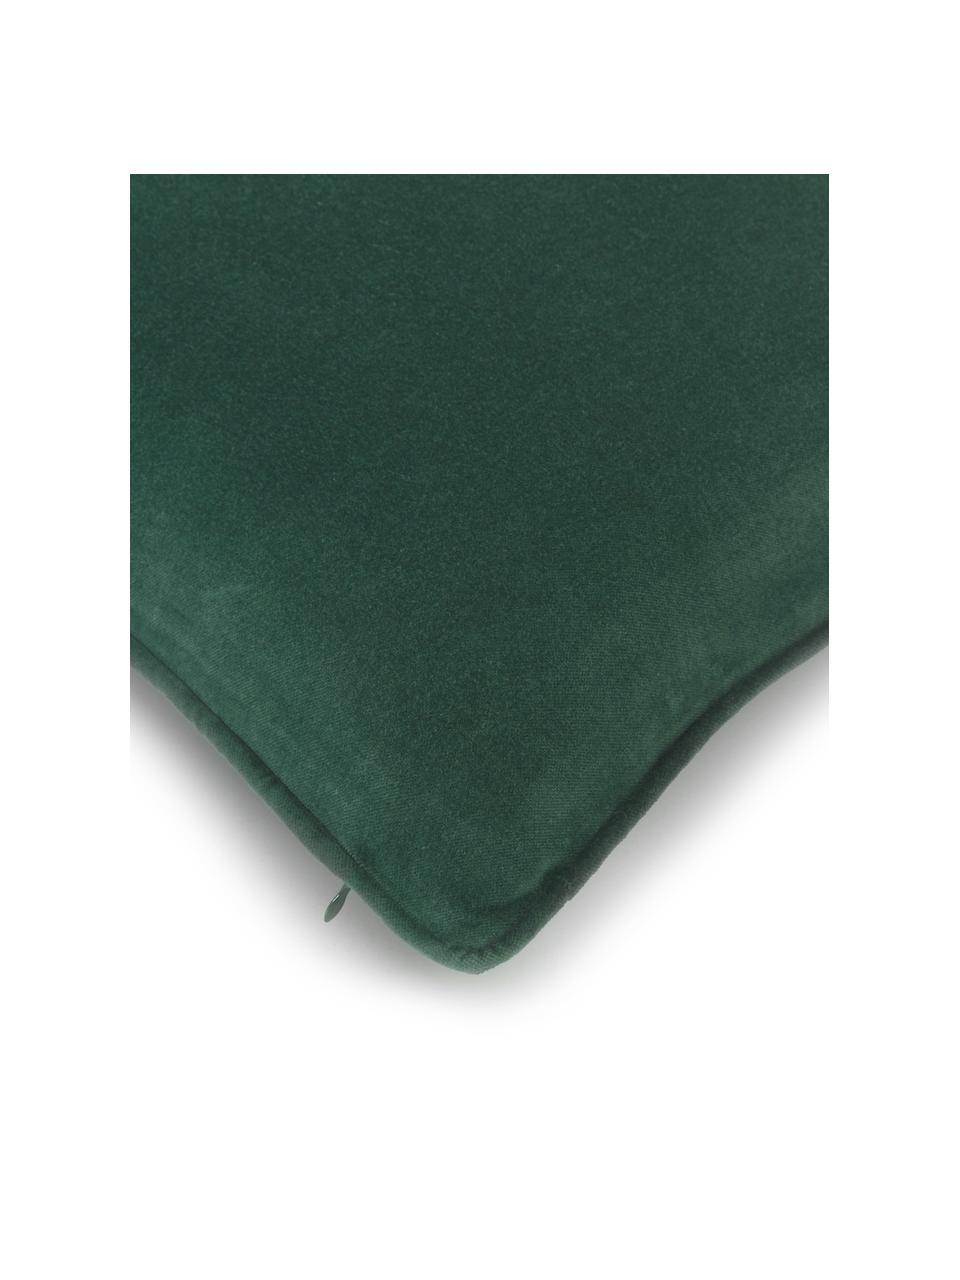 Einfarbige Samt-Kissenhülle Dana in Smaragdgrün, 100% Baumwollsamt, Smaragdgrün, 30 x 50 cm